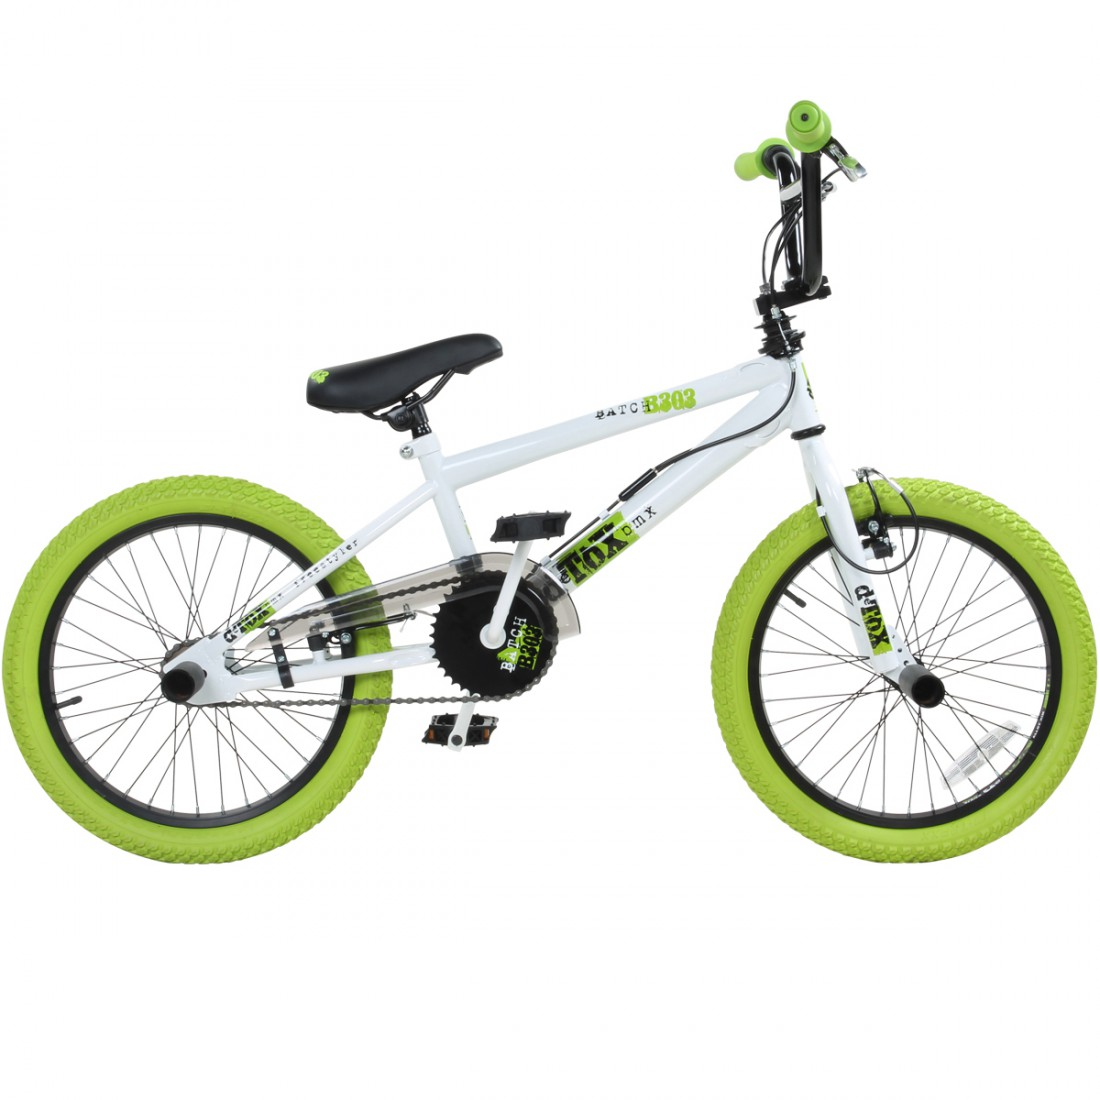 bmx 18 zoll fahrrad freestyle bike kinderfahrrad kind. Black Bedroom Furniture Sets. Home Design Ideas